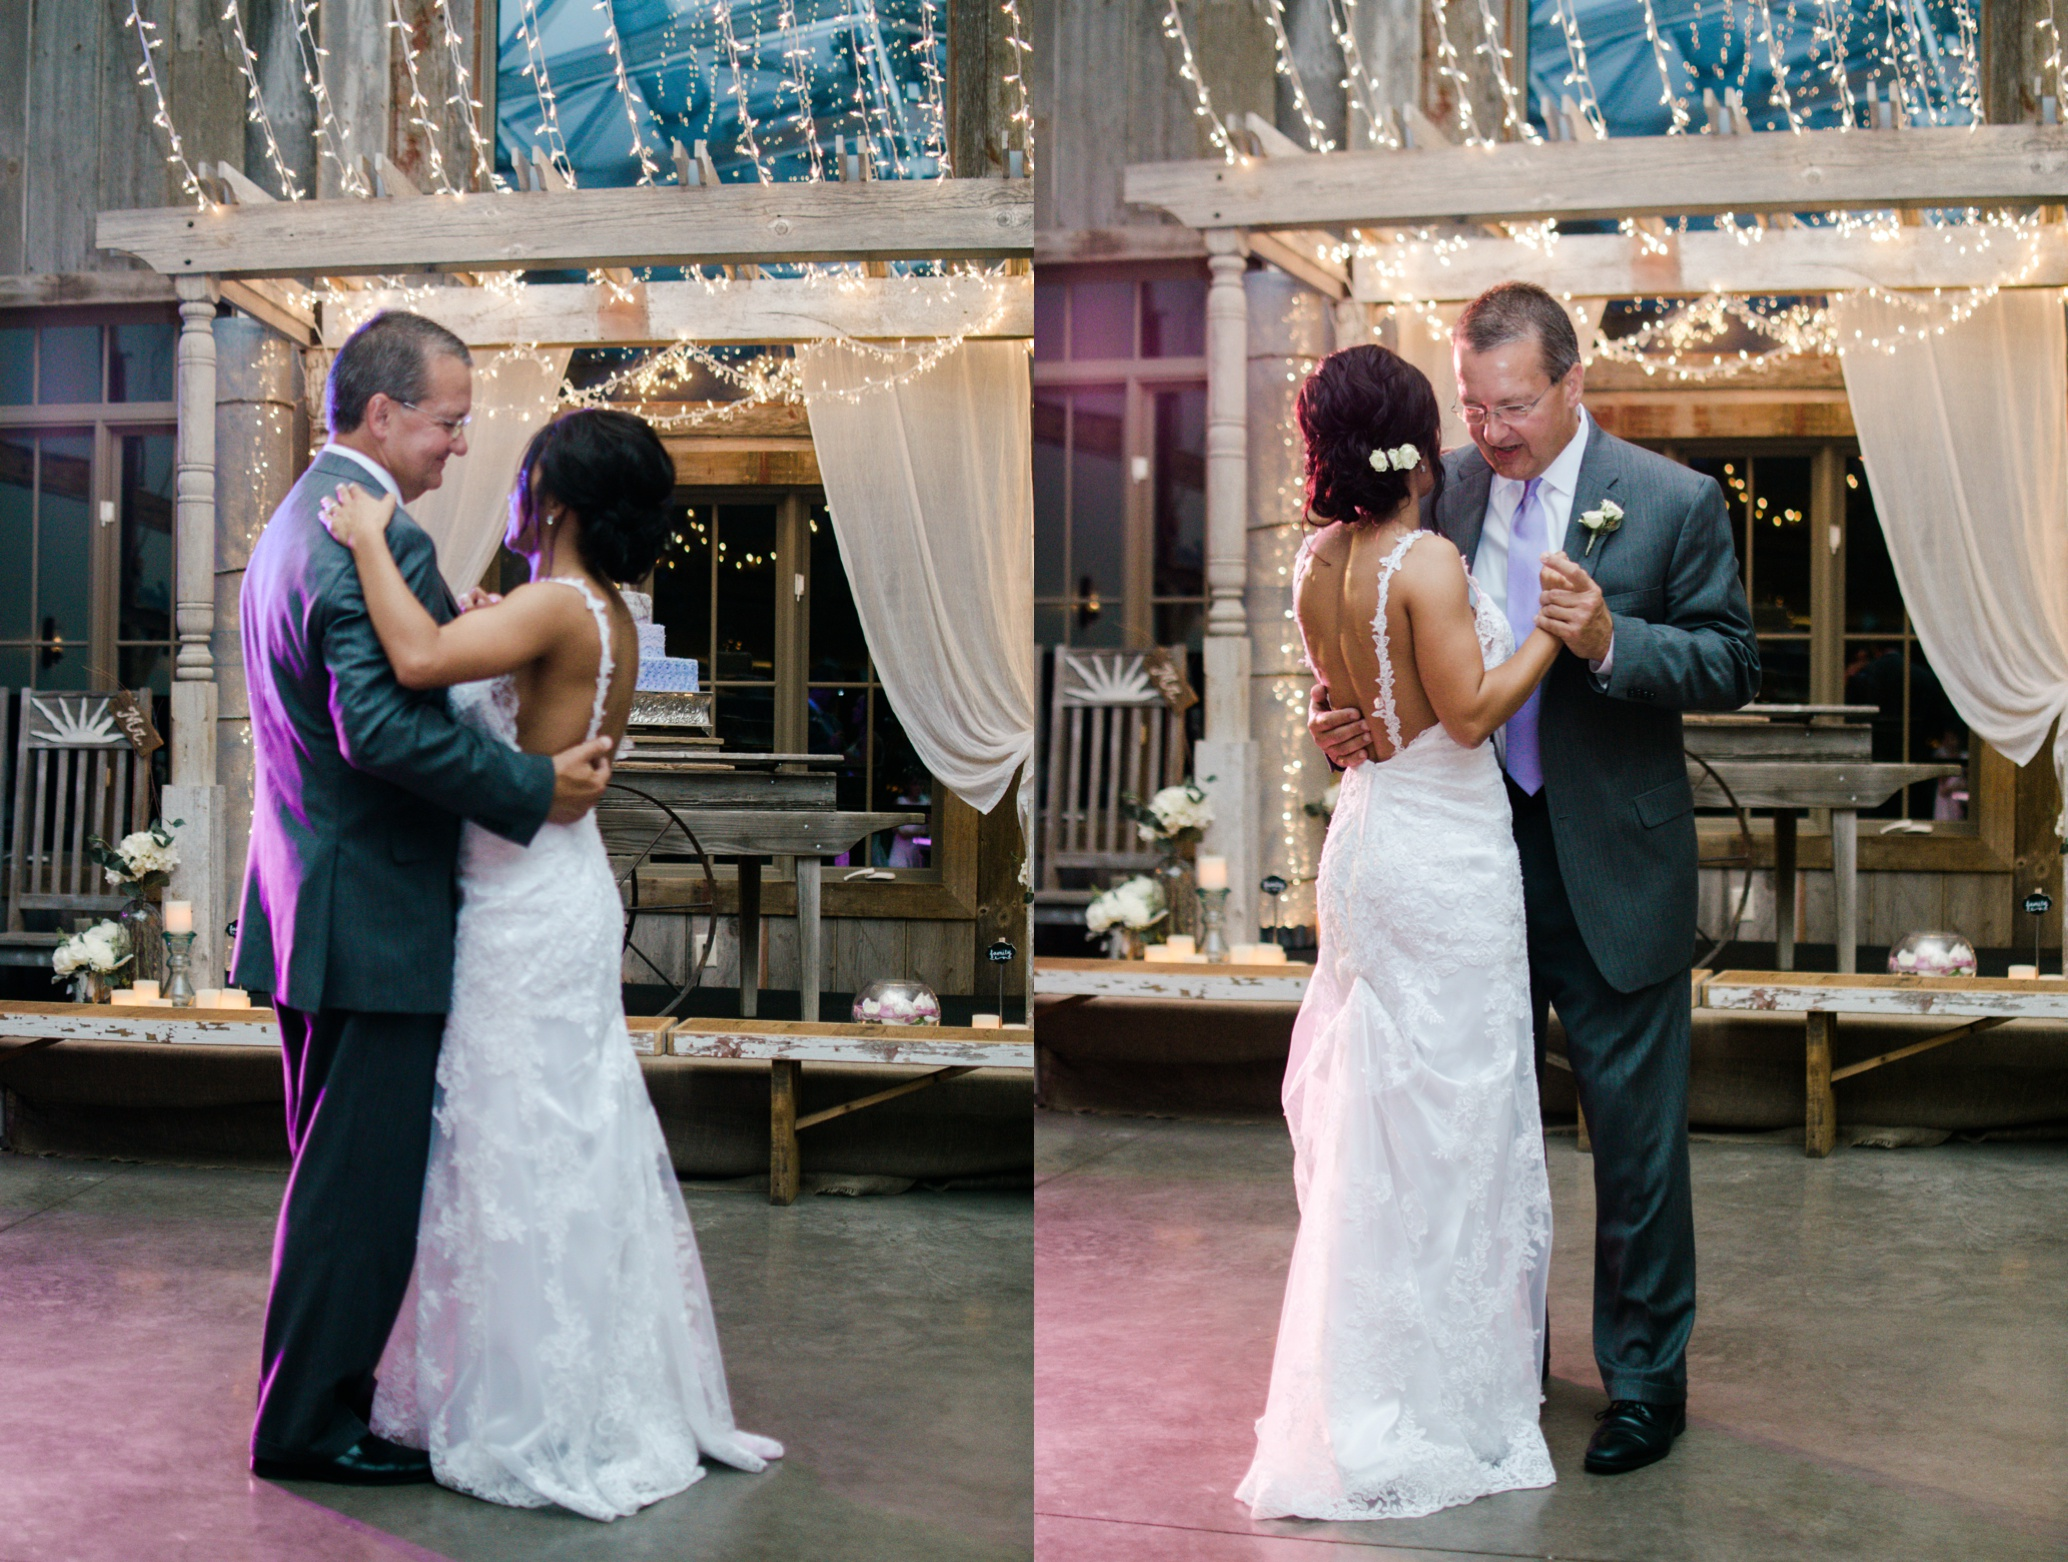 Barnes' Place Rustic Outdoor Wedding | Ali Leigh Photo Minneapolis Wedding Photographer_0174.jpg